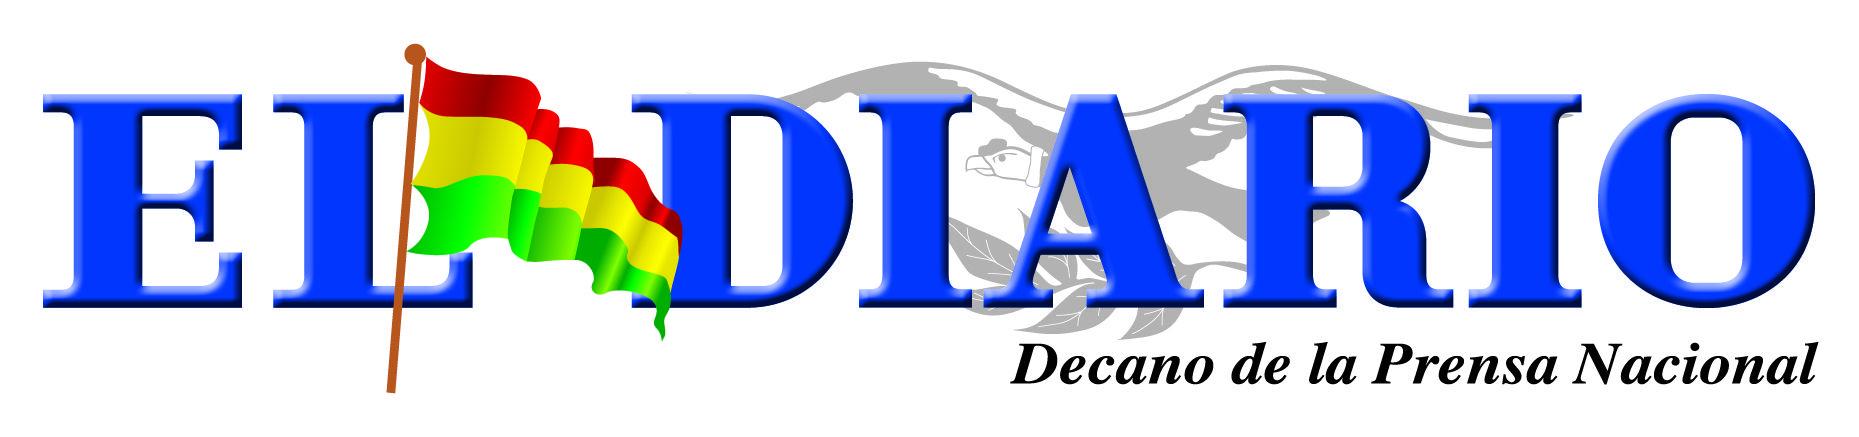 El Diario (With images) Gaming logos, Logos